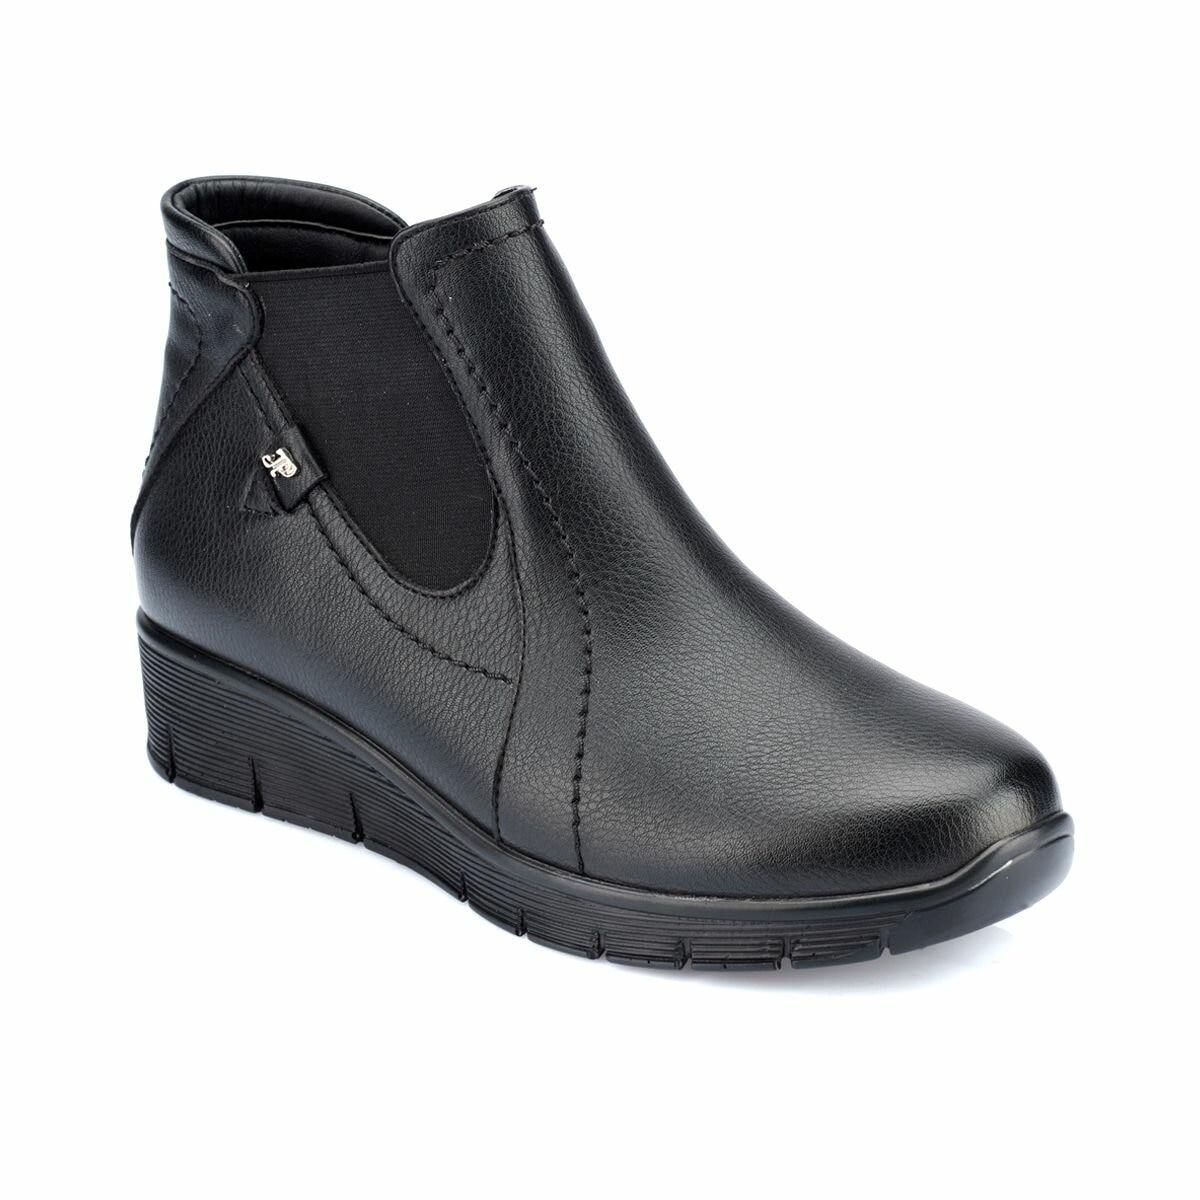 FLO 82.150306.Z Black Women Boots Polaris